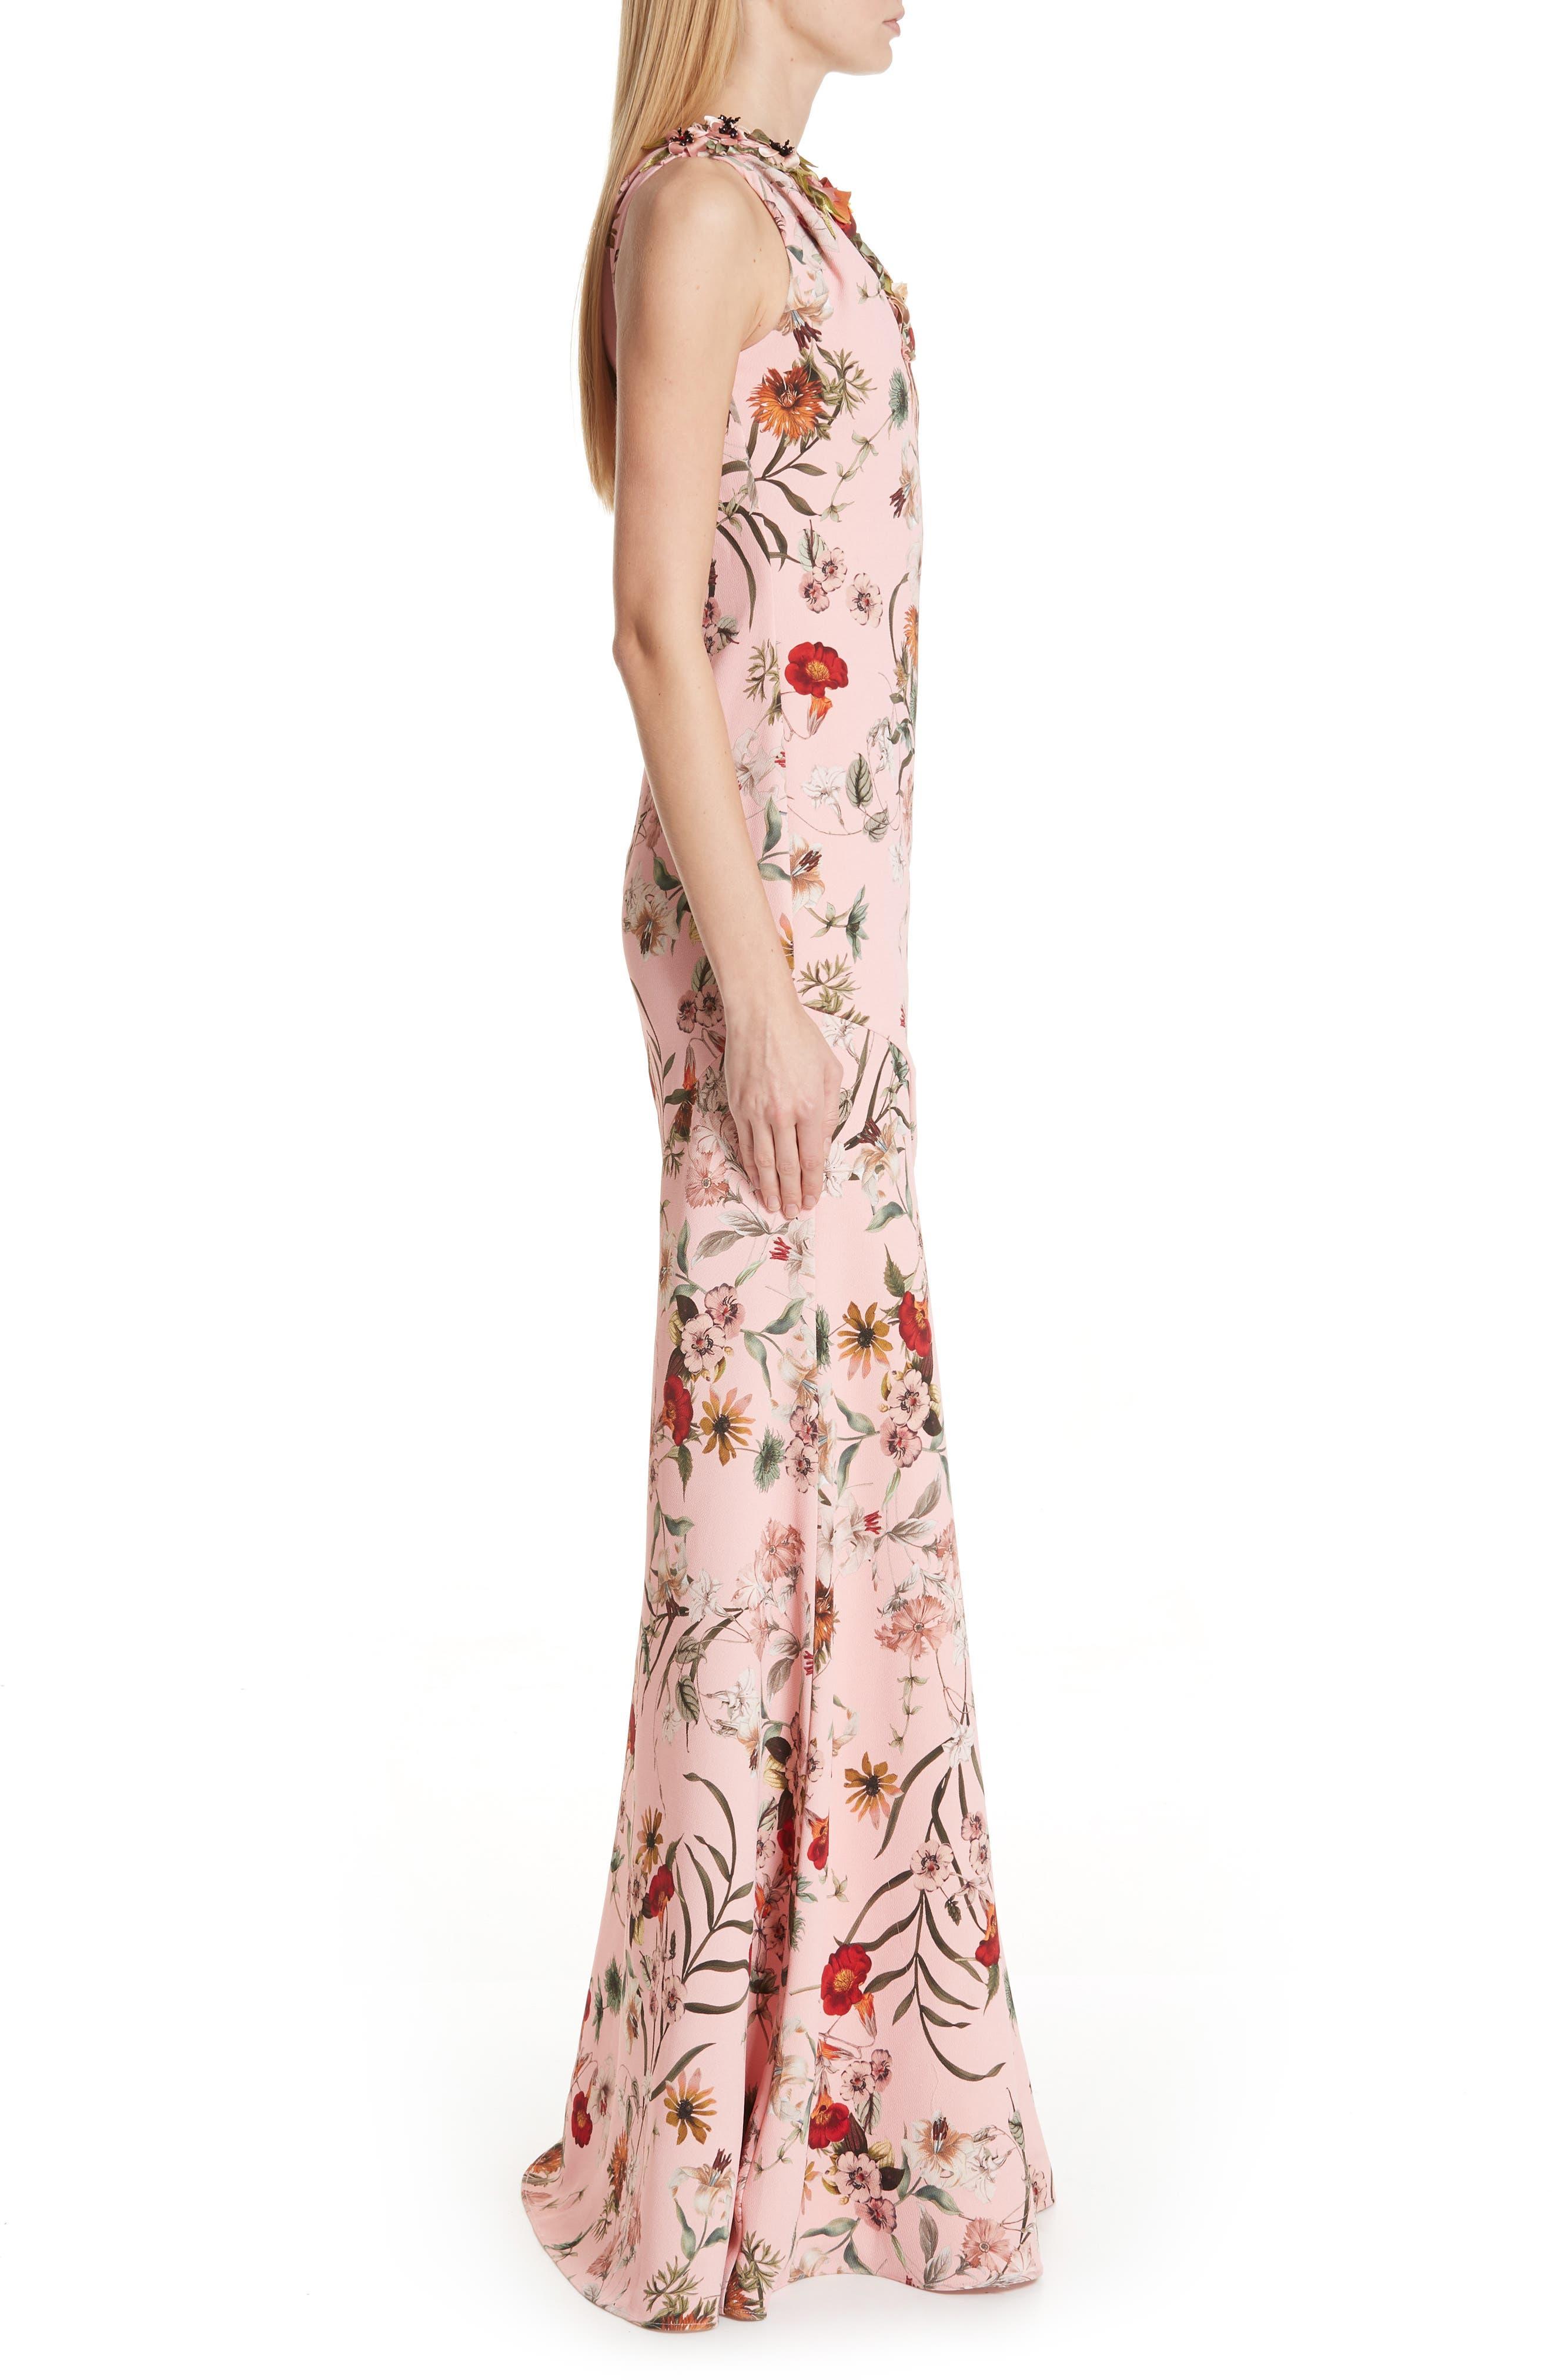 BADGLEY MISCHKA COLLECTION,                             Badgley Mischka One-Shoulder Floral Evening Dress,                             Alternate thumbnail 3, color,                             650